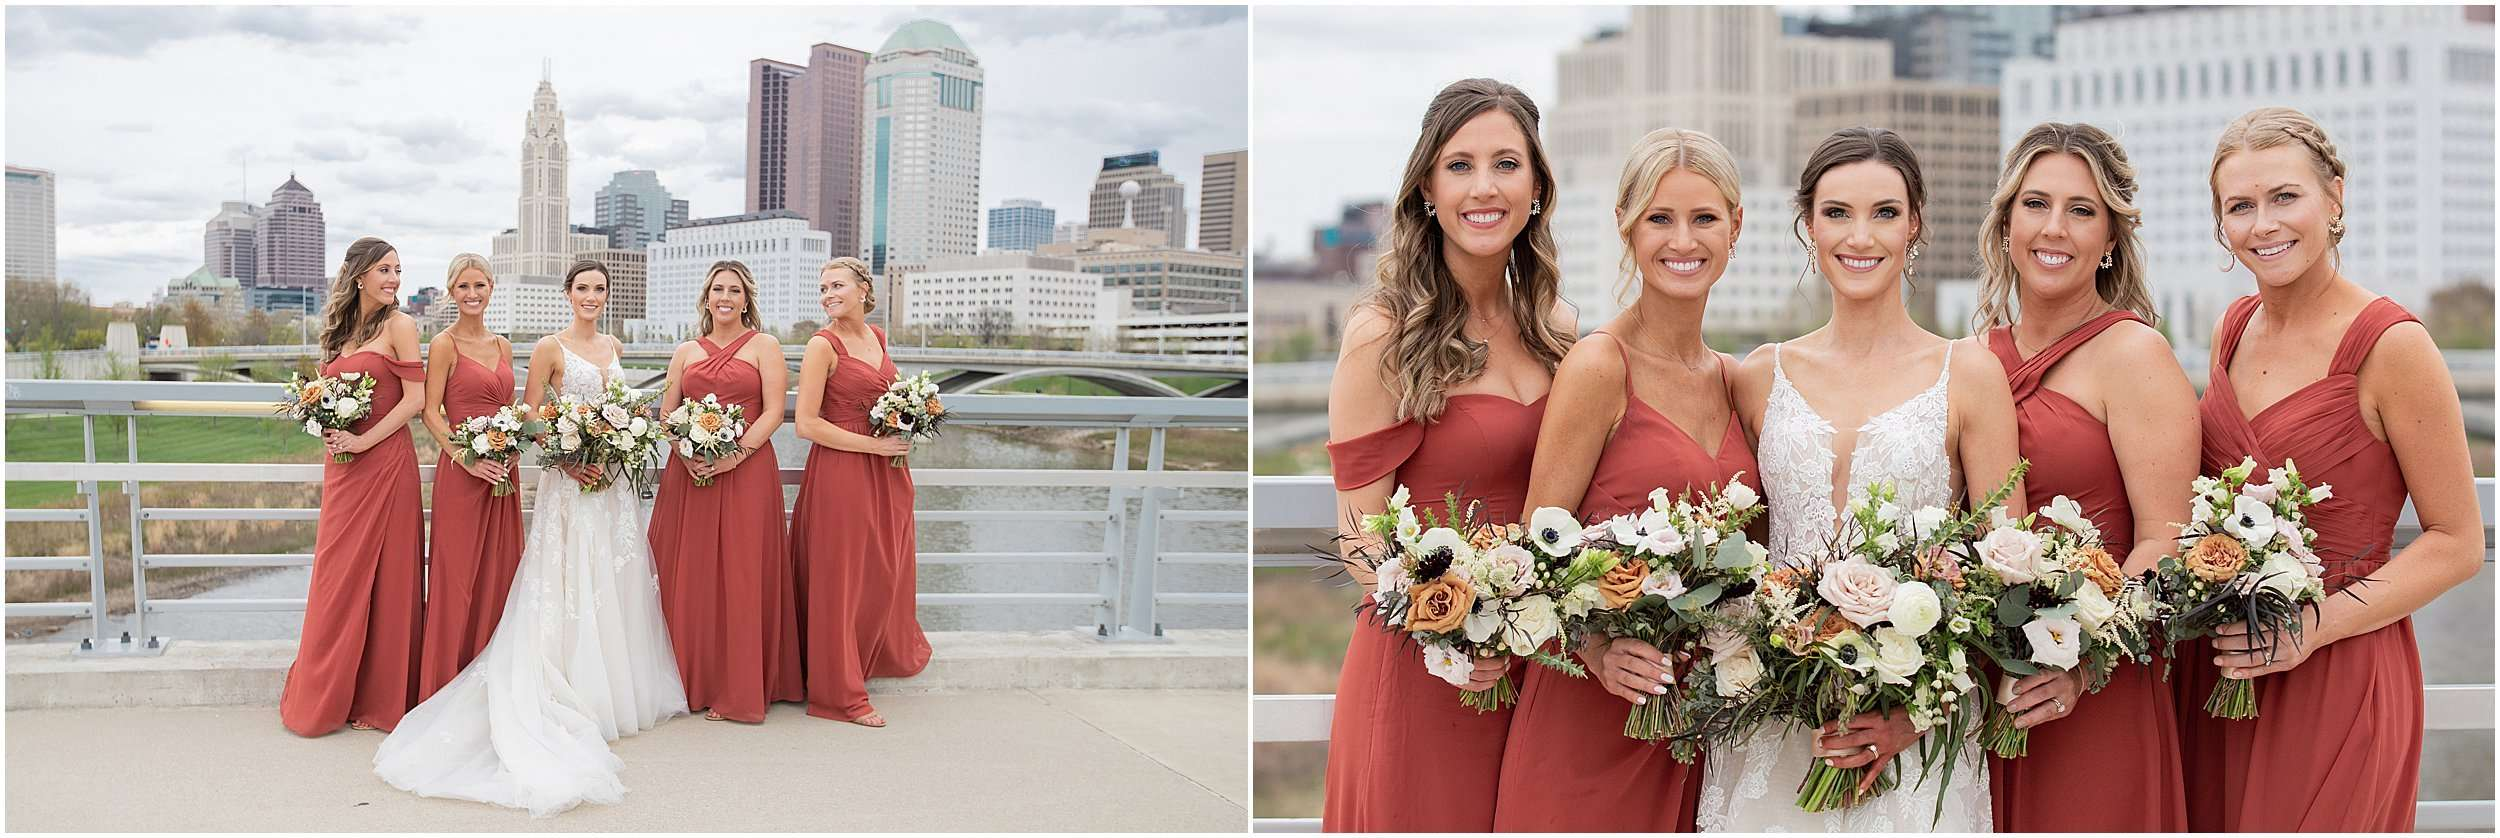 Columbus, Ohio Wedding Photography | Strongwater Events 146